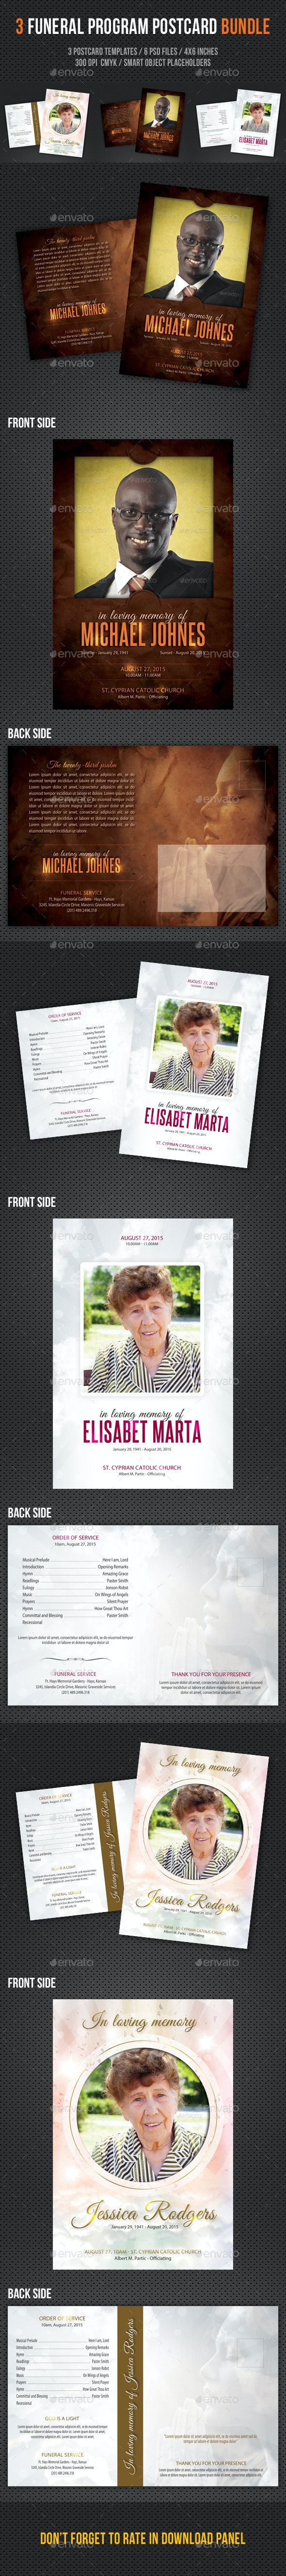 3 in 1 Funeral Program Postcard Bundle - Invitations Cards & Invites